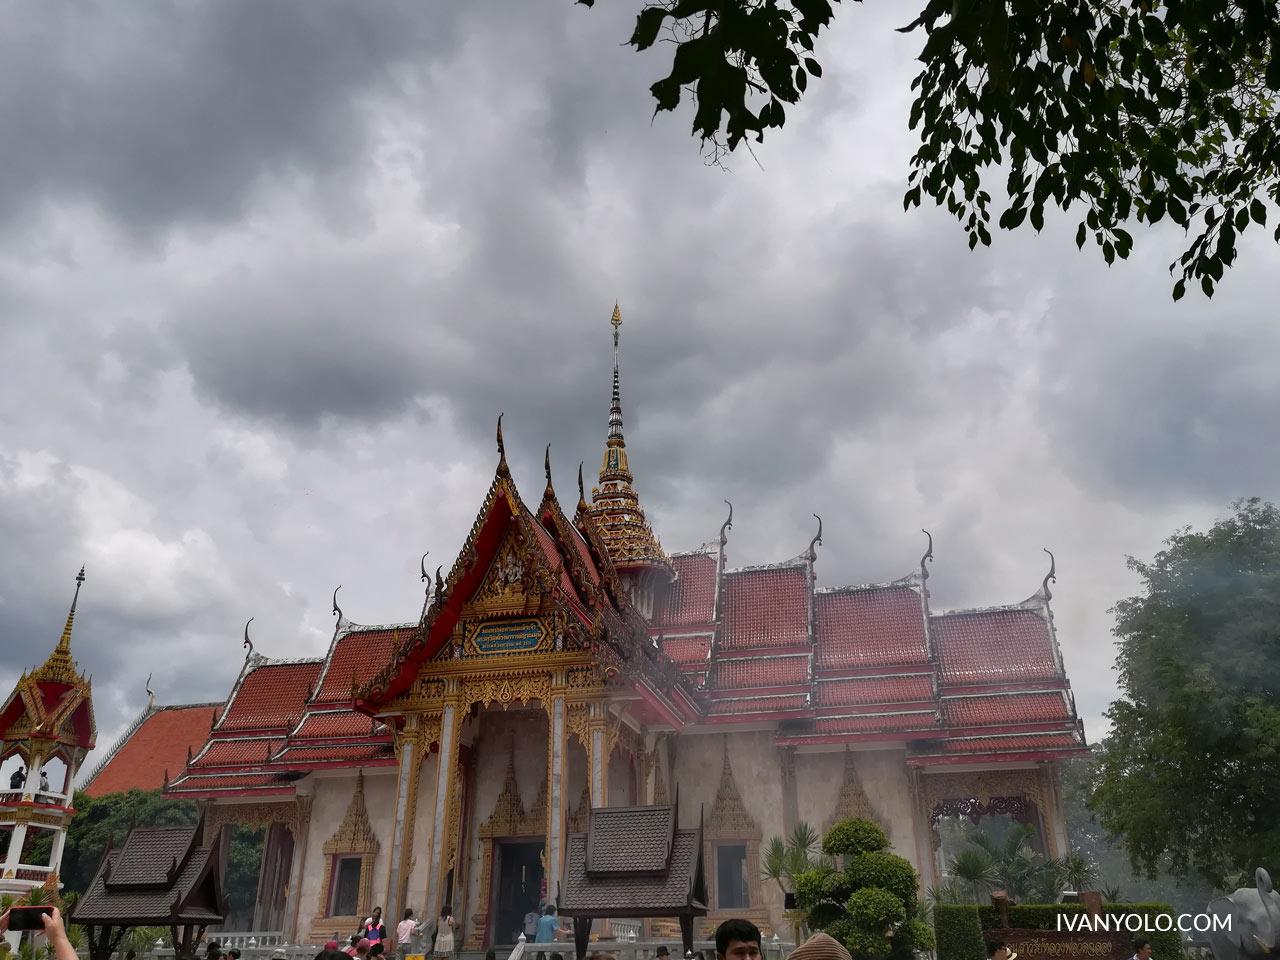 Wat Chalong Phuket HDR